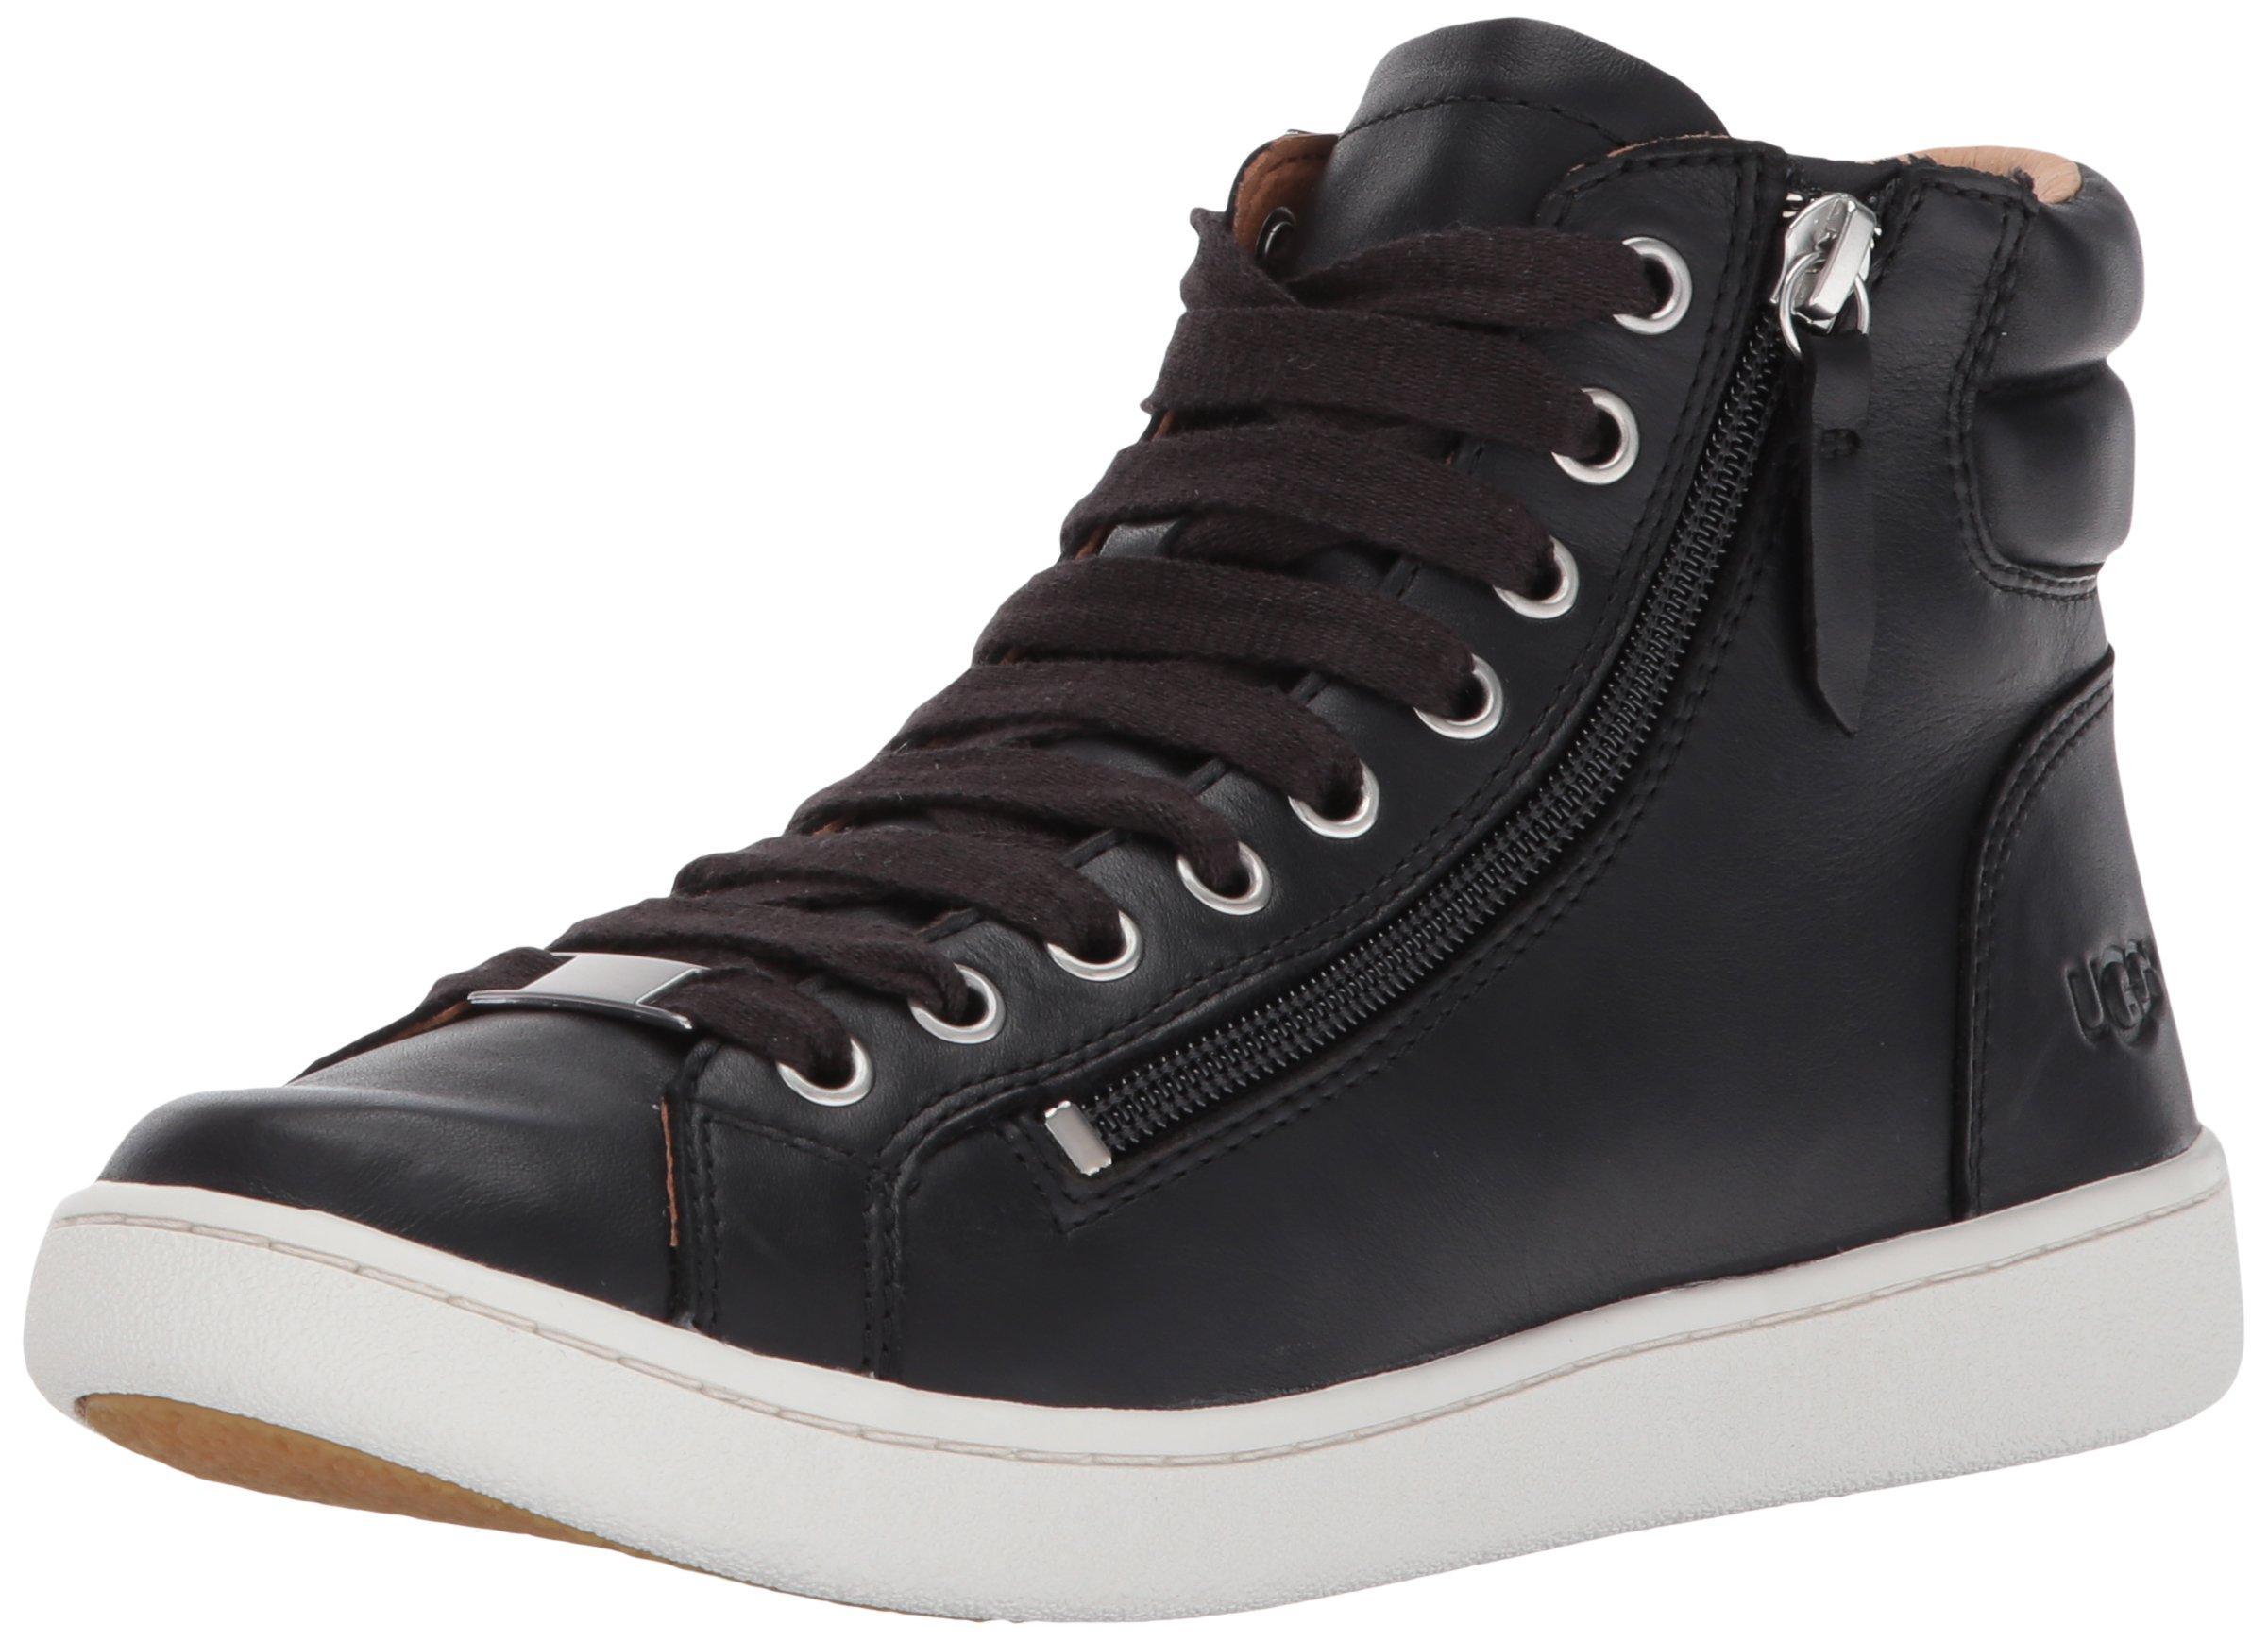 UGG Women's Olive Fashion Sneaker,Black,9 M US